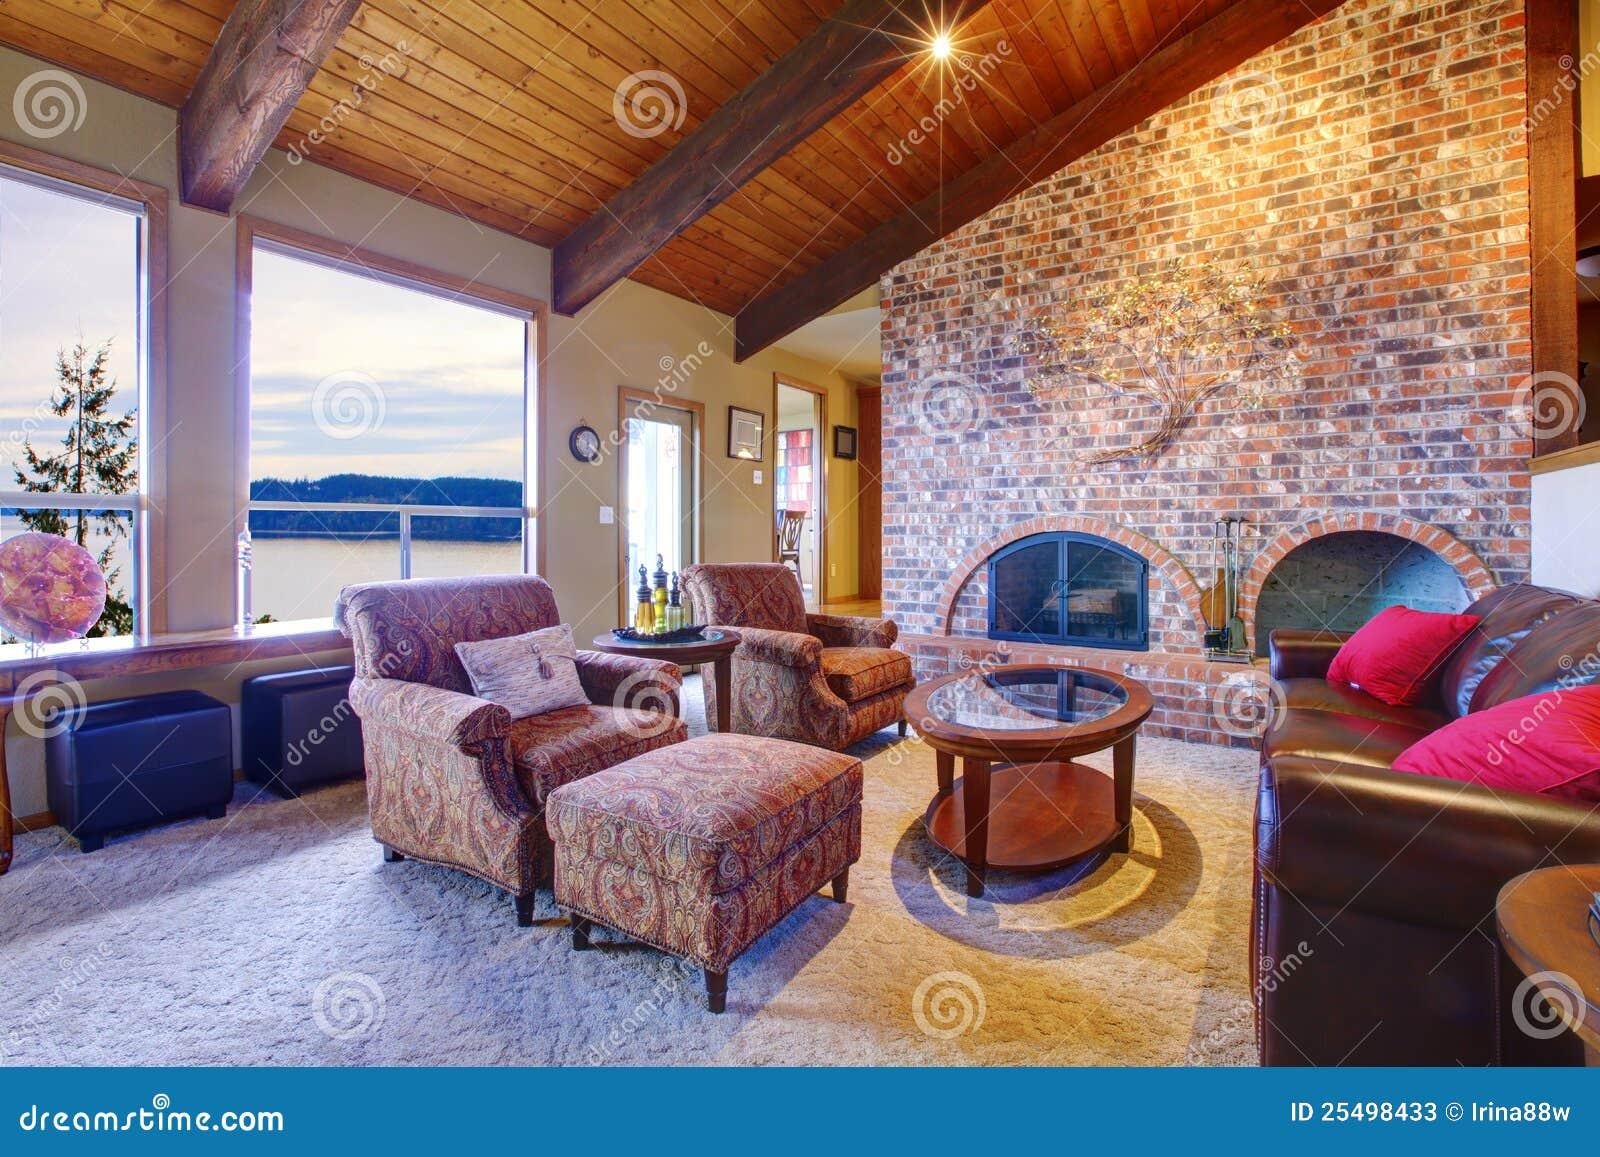 Woonkamer met houten plafond en open haard stock afbeelding afbeelding 25498433 - Decoratie woonkamer plafond ...